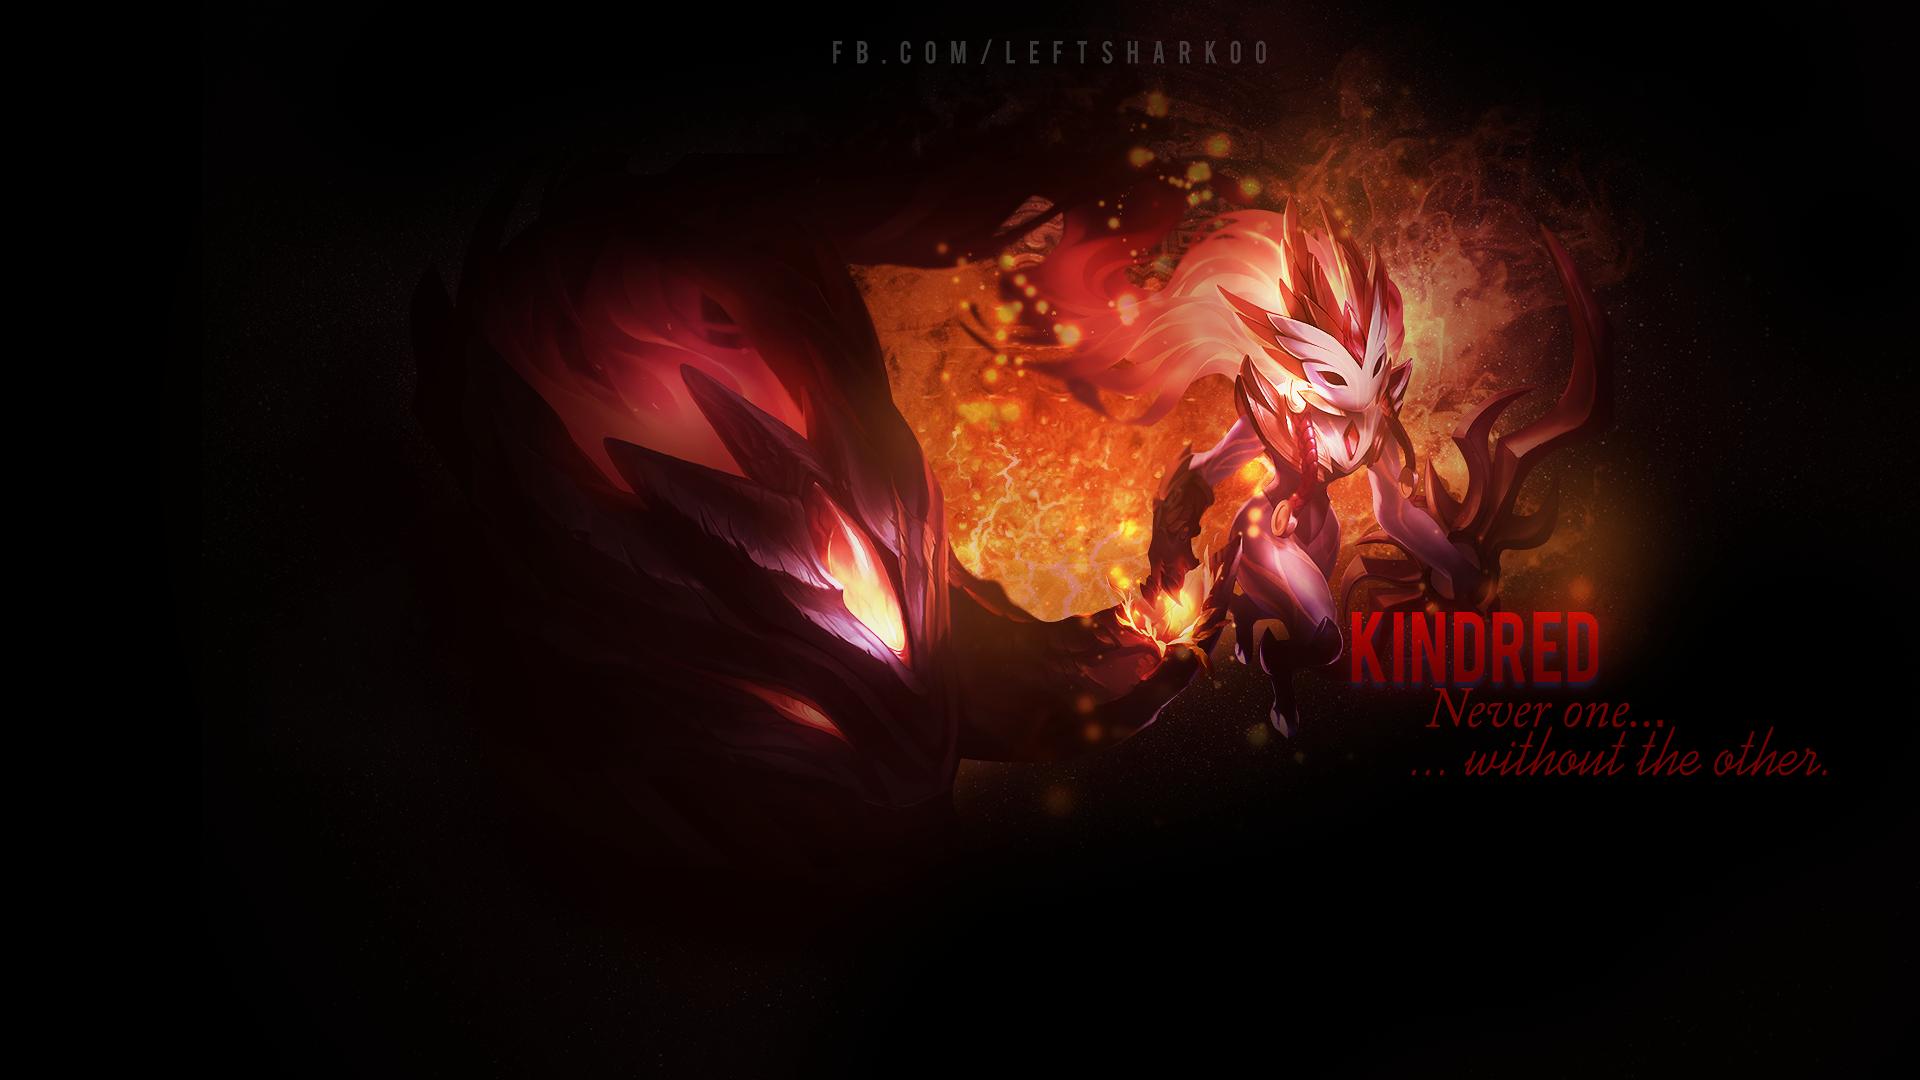 Kindred Minimalist Wallpaper League Of Legends By: Kindred Wallpaper League Of Legends By LeftLucy On DeviantArt